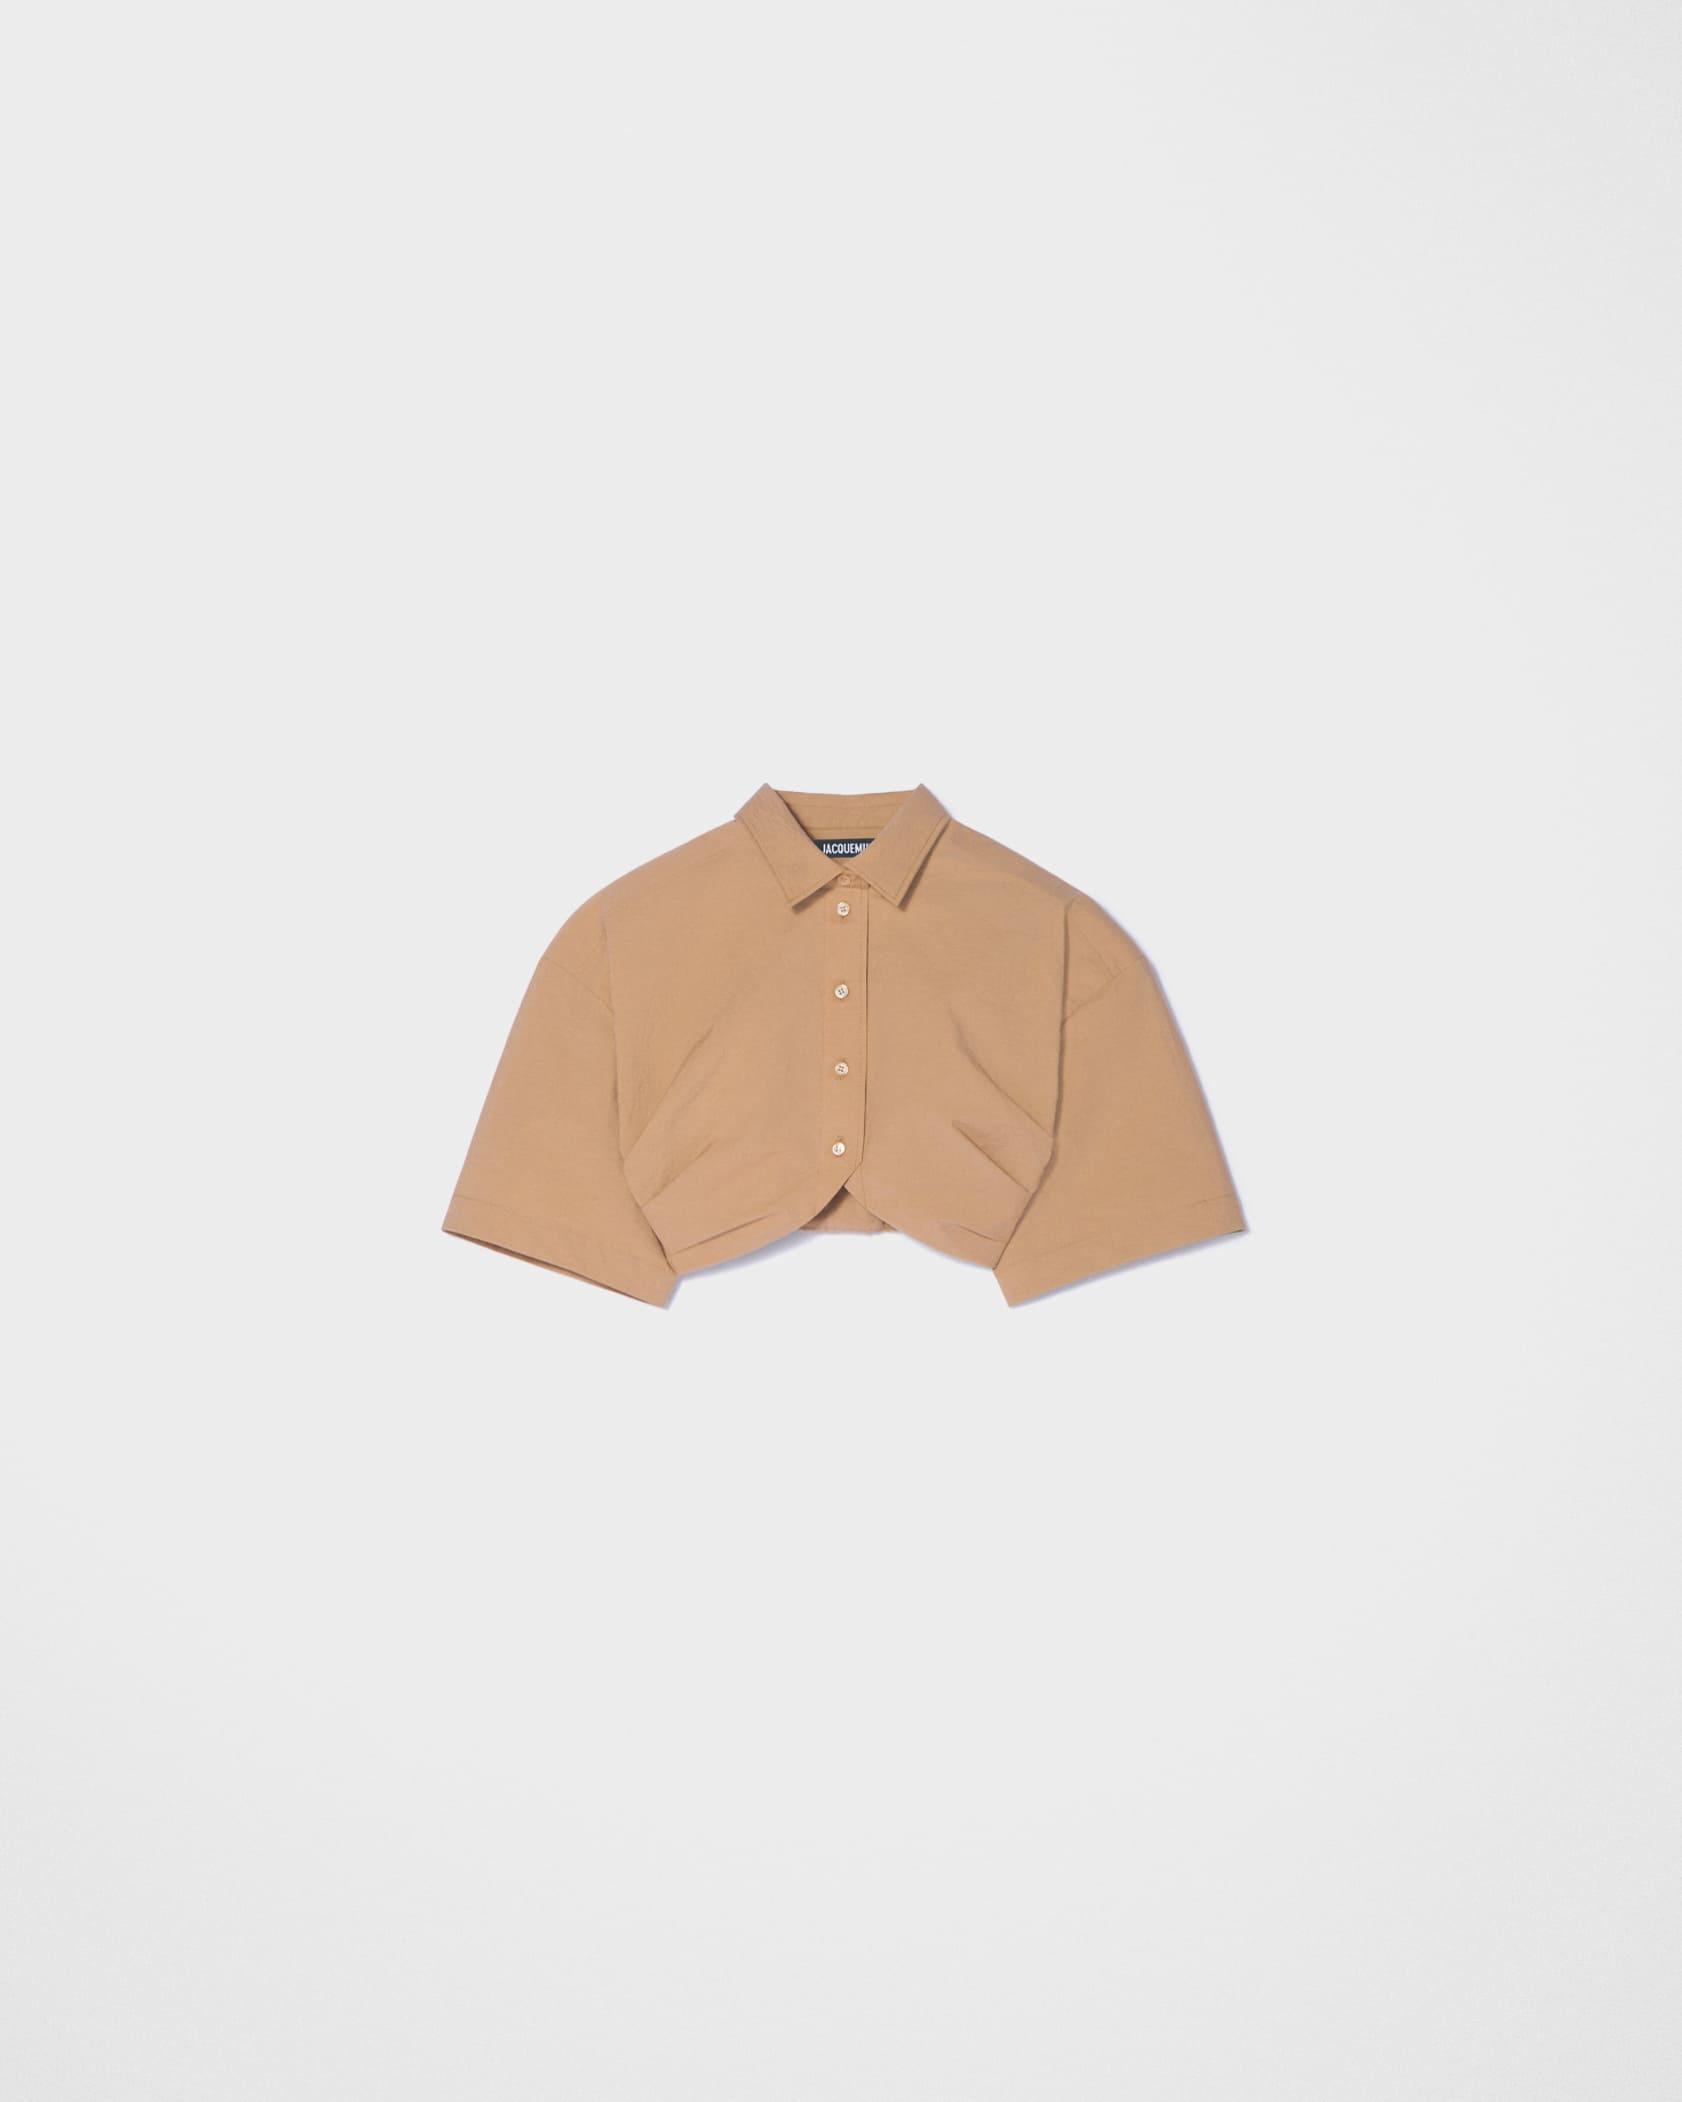 La chemise Ballu